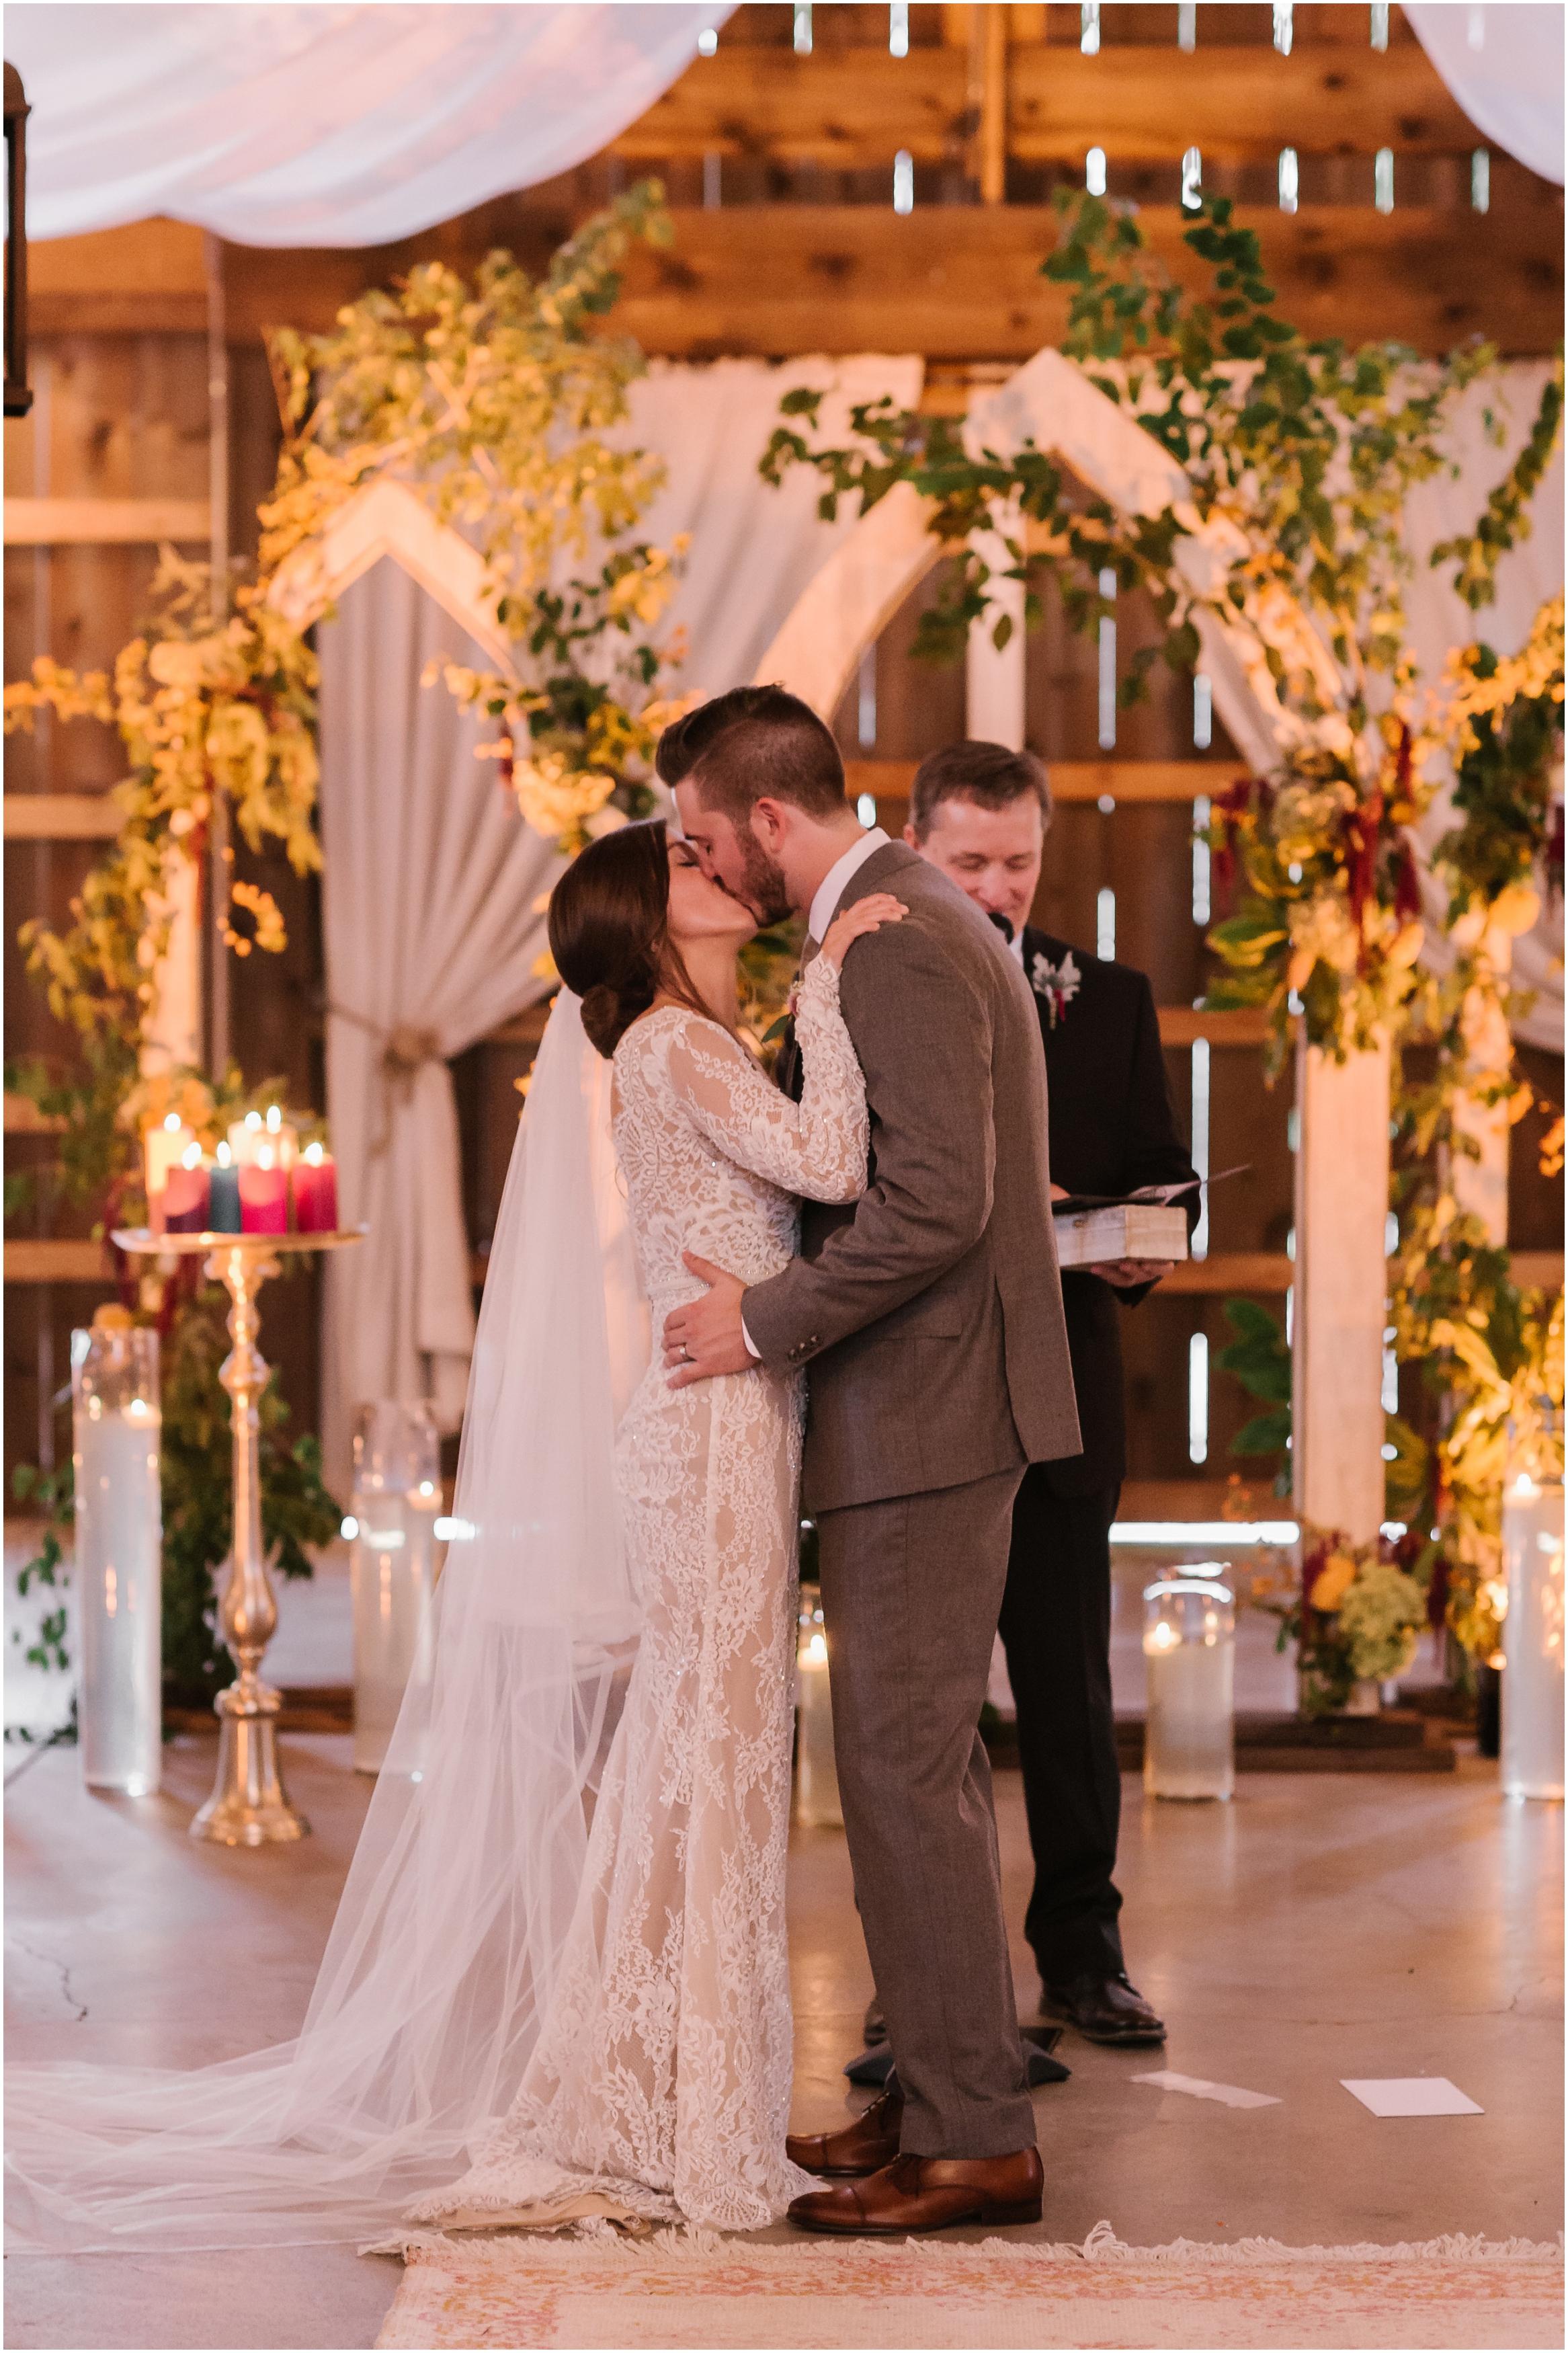 Rebecca_Shehorn_Photography_Indianapolis_Wedding_Photographer_9271.jpg